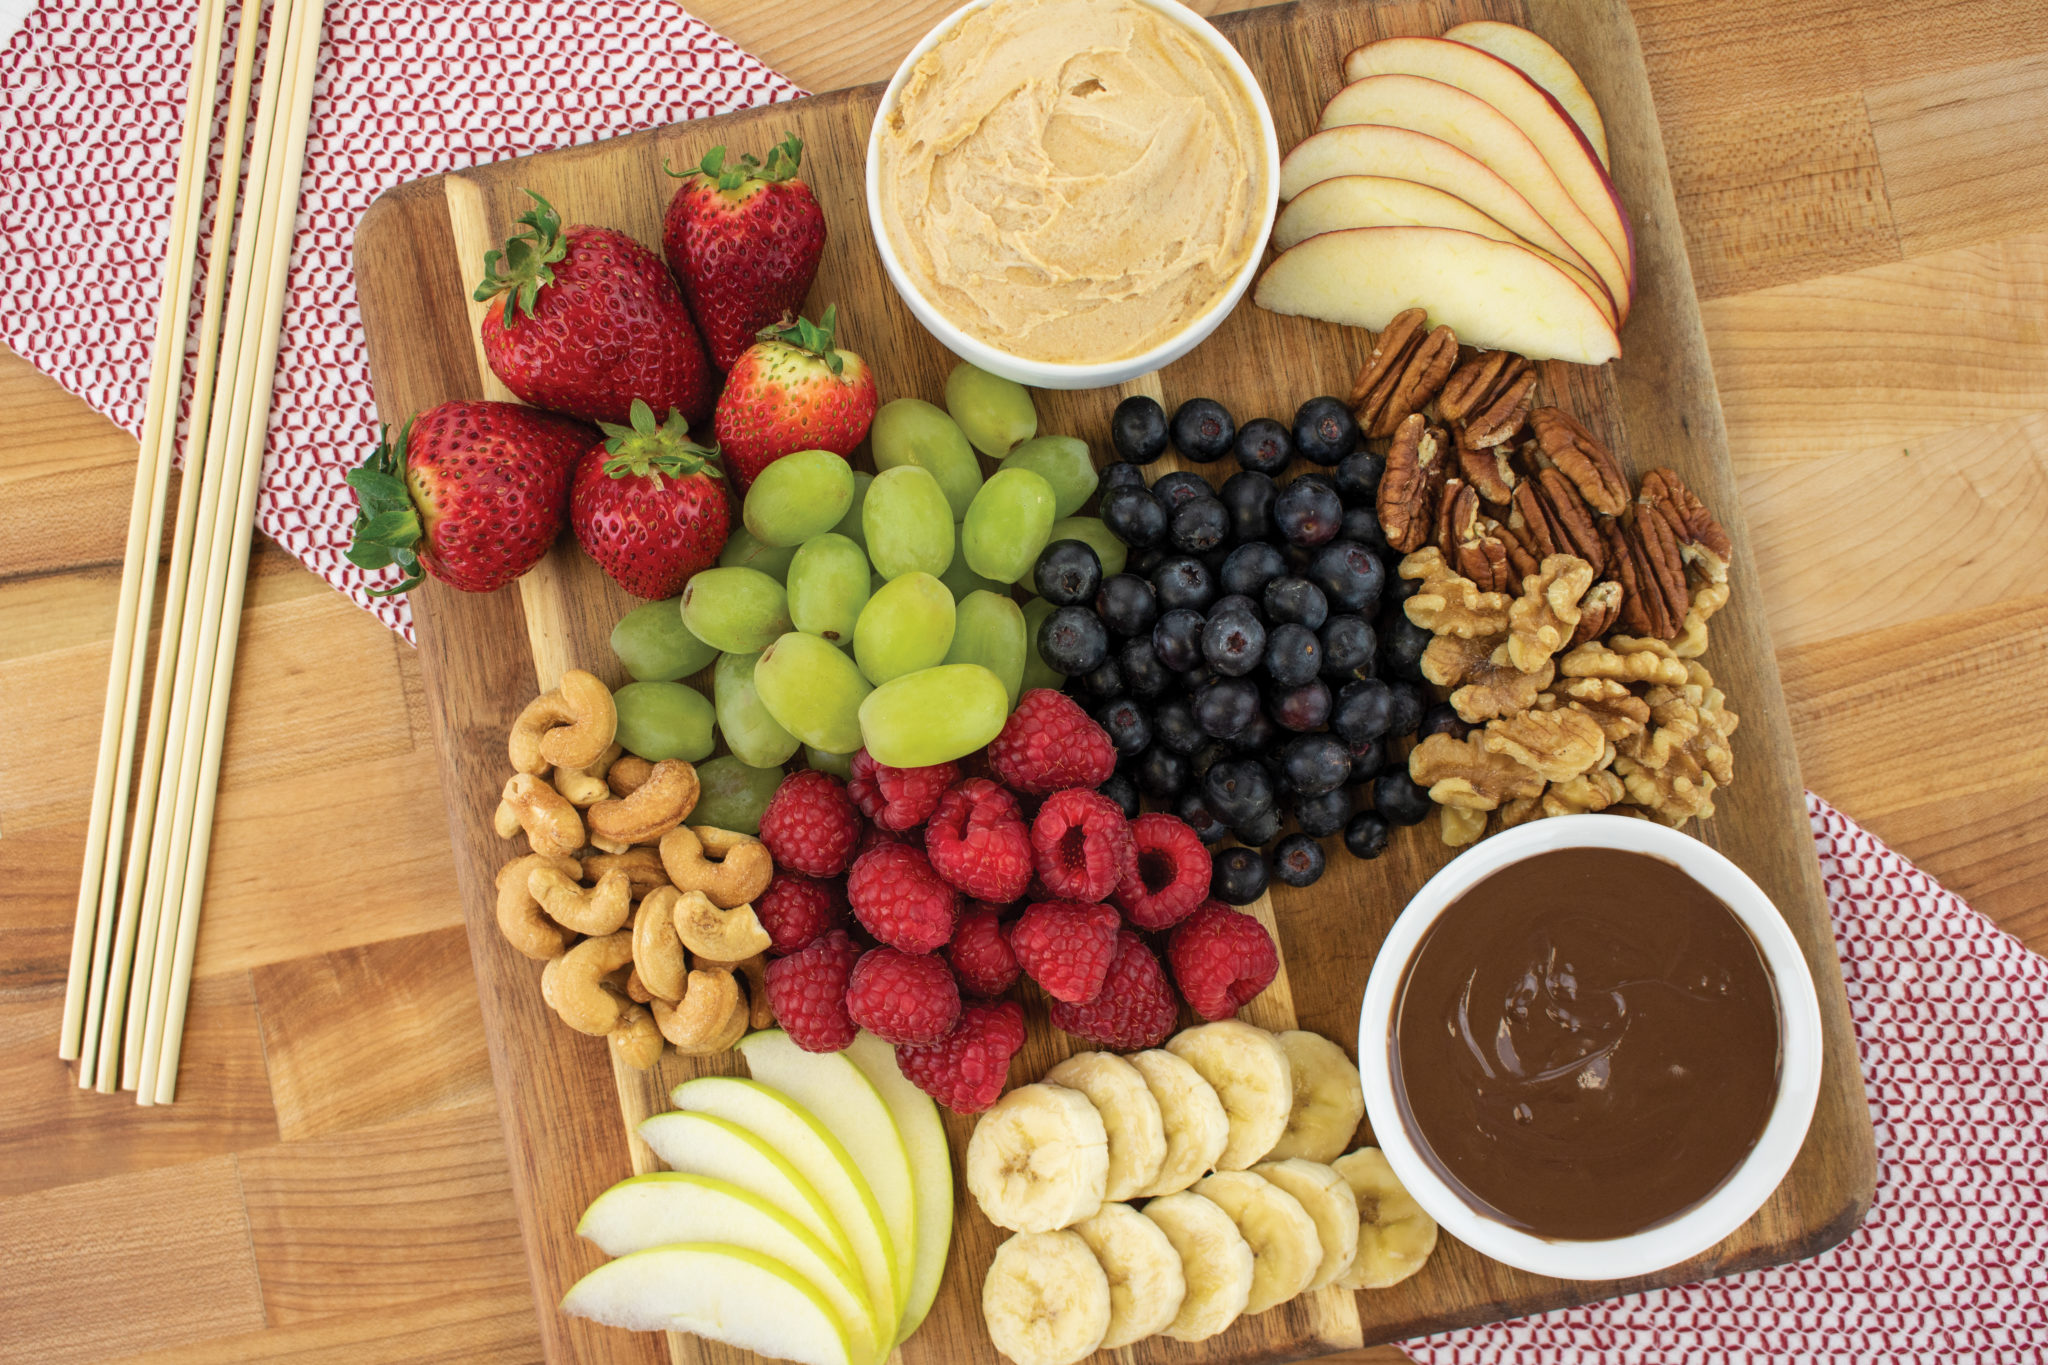 DIY Healthy Dessert Platter